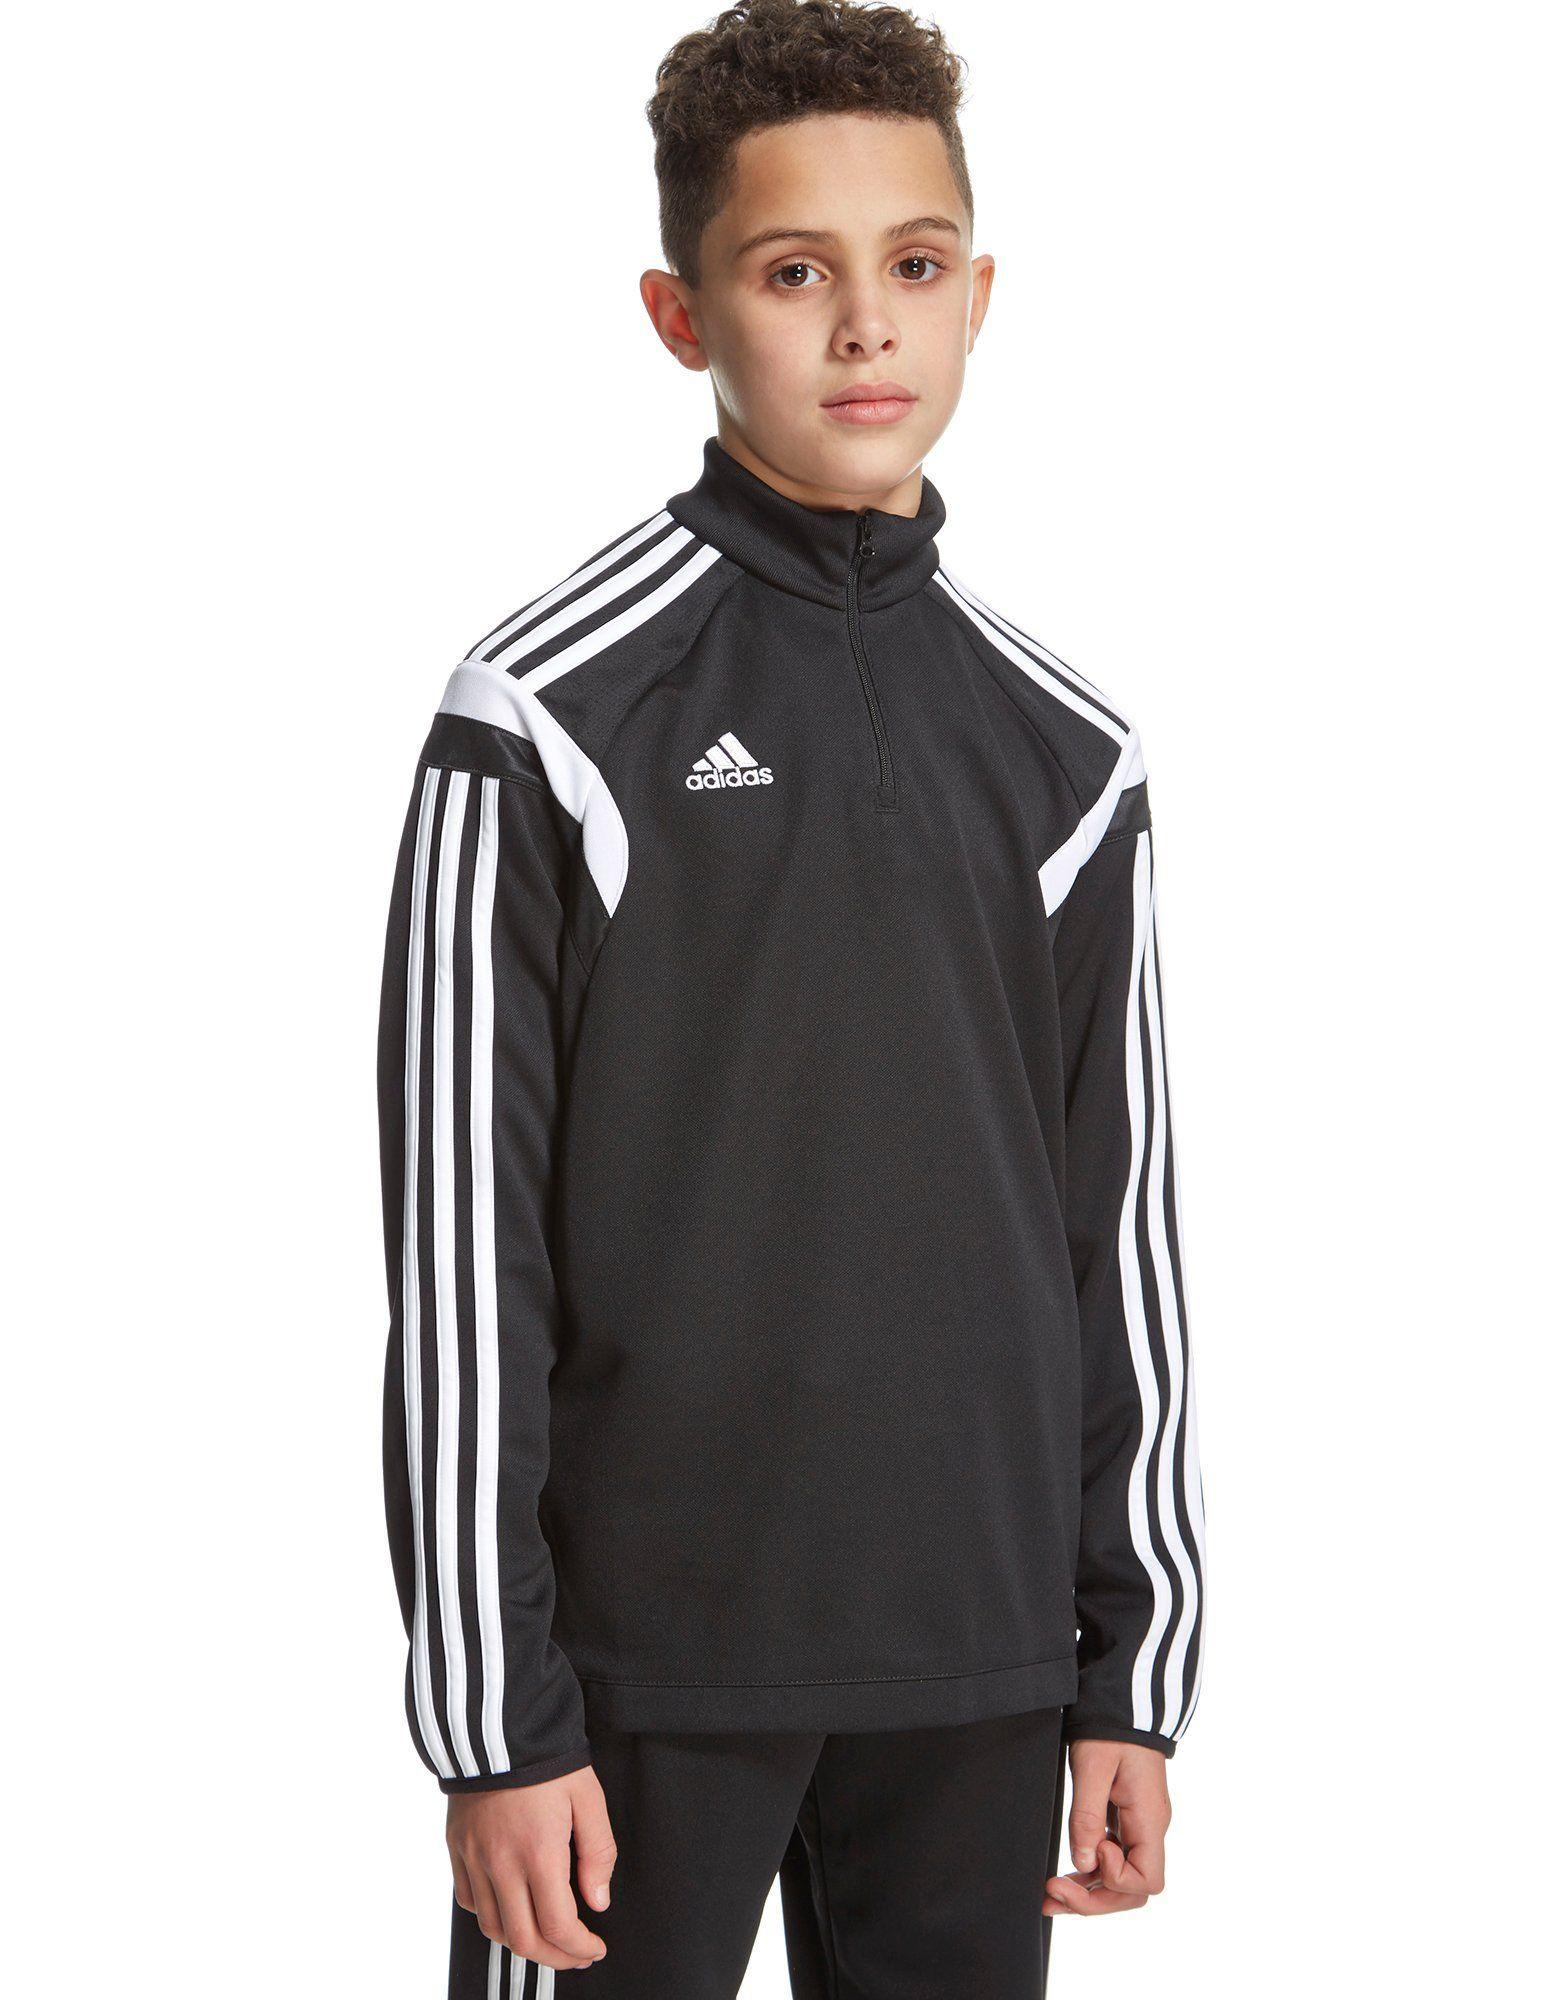 adidas Condivo 14 Training Top Junior - Shop online for adidas Condivo 14  Training Top Junior with JD Sports d35755fac